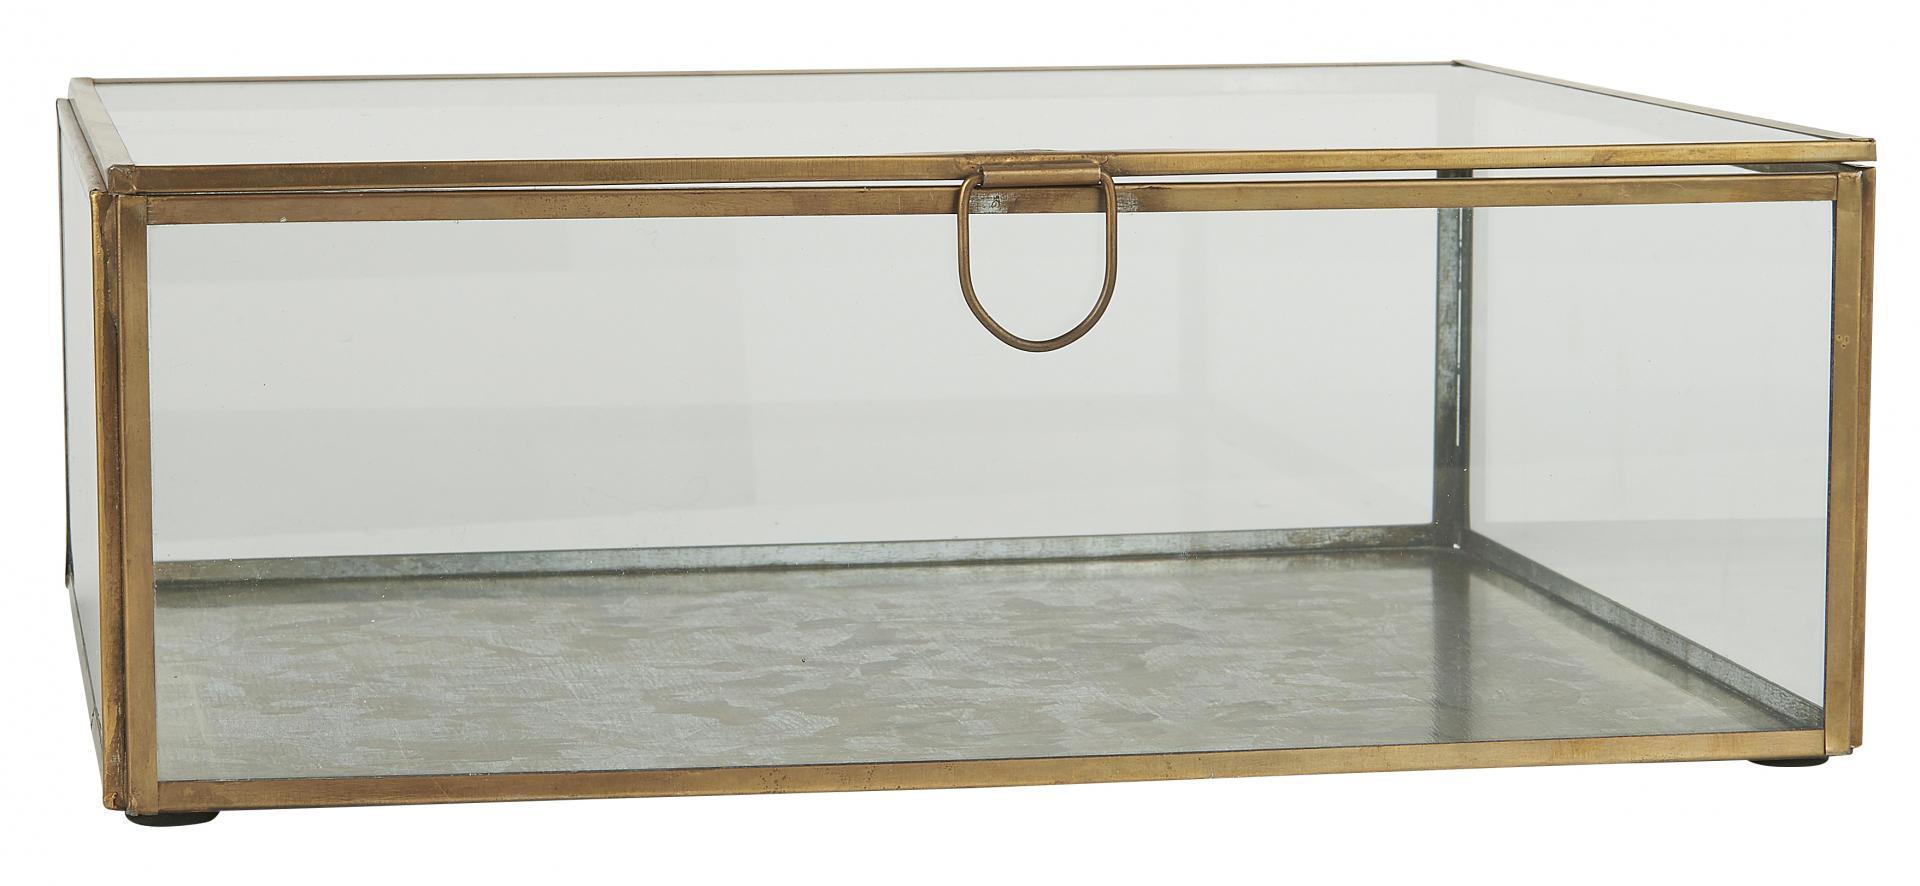 IB LAURSEN Sklenený box Antique Brass